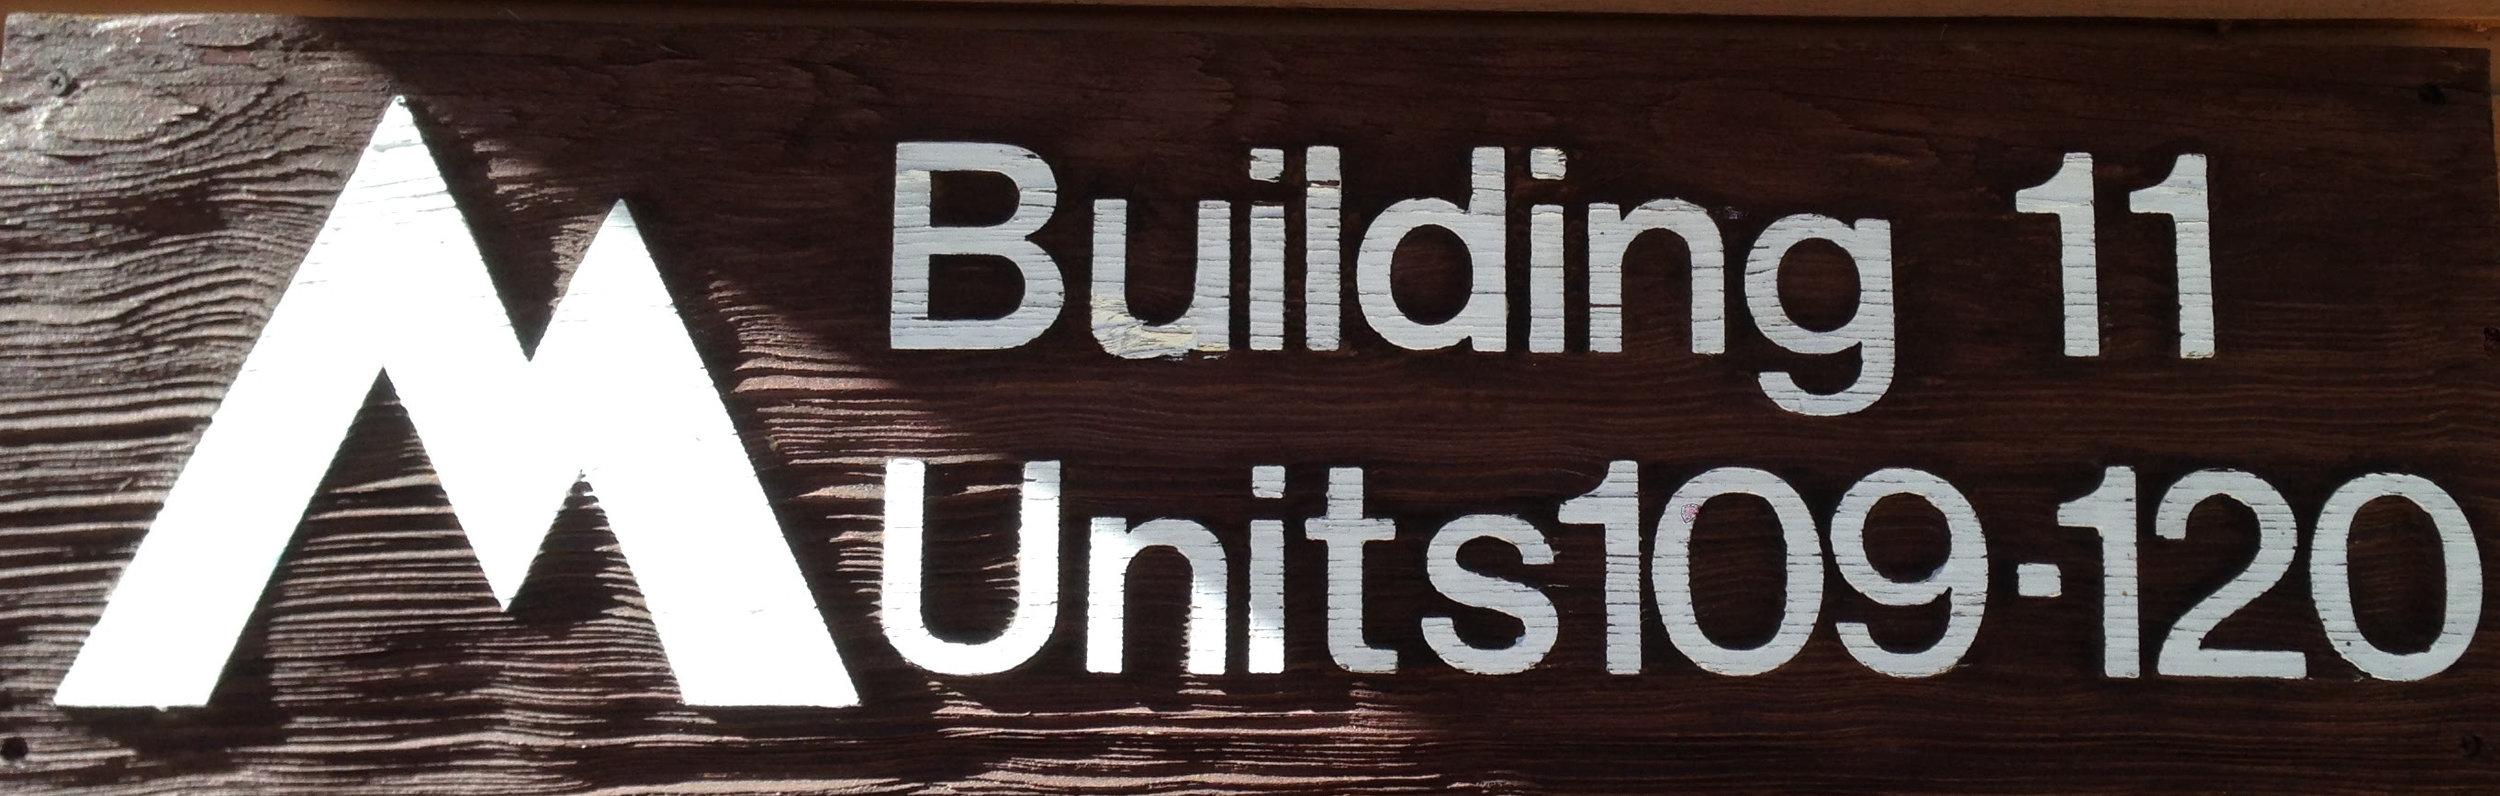 building 11.jpg